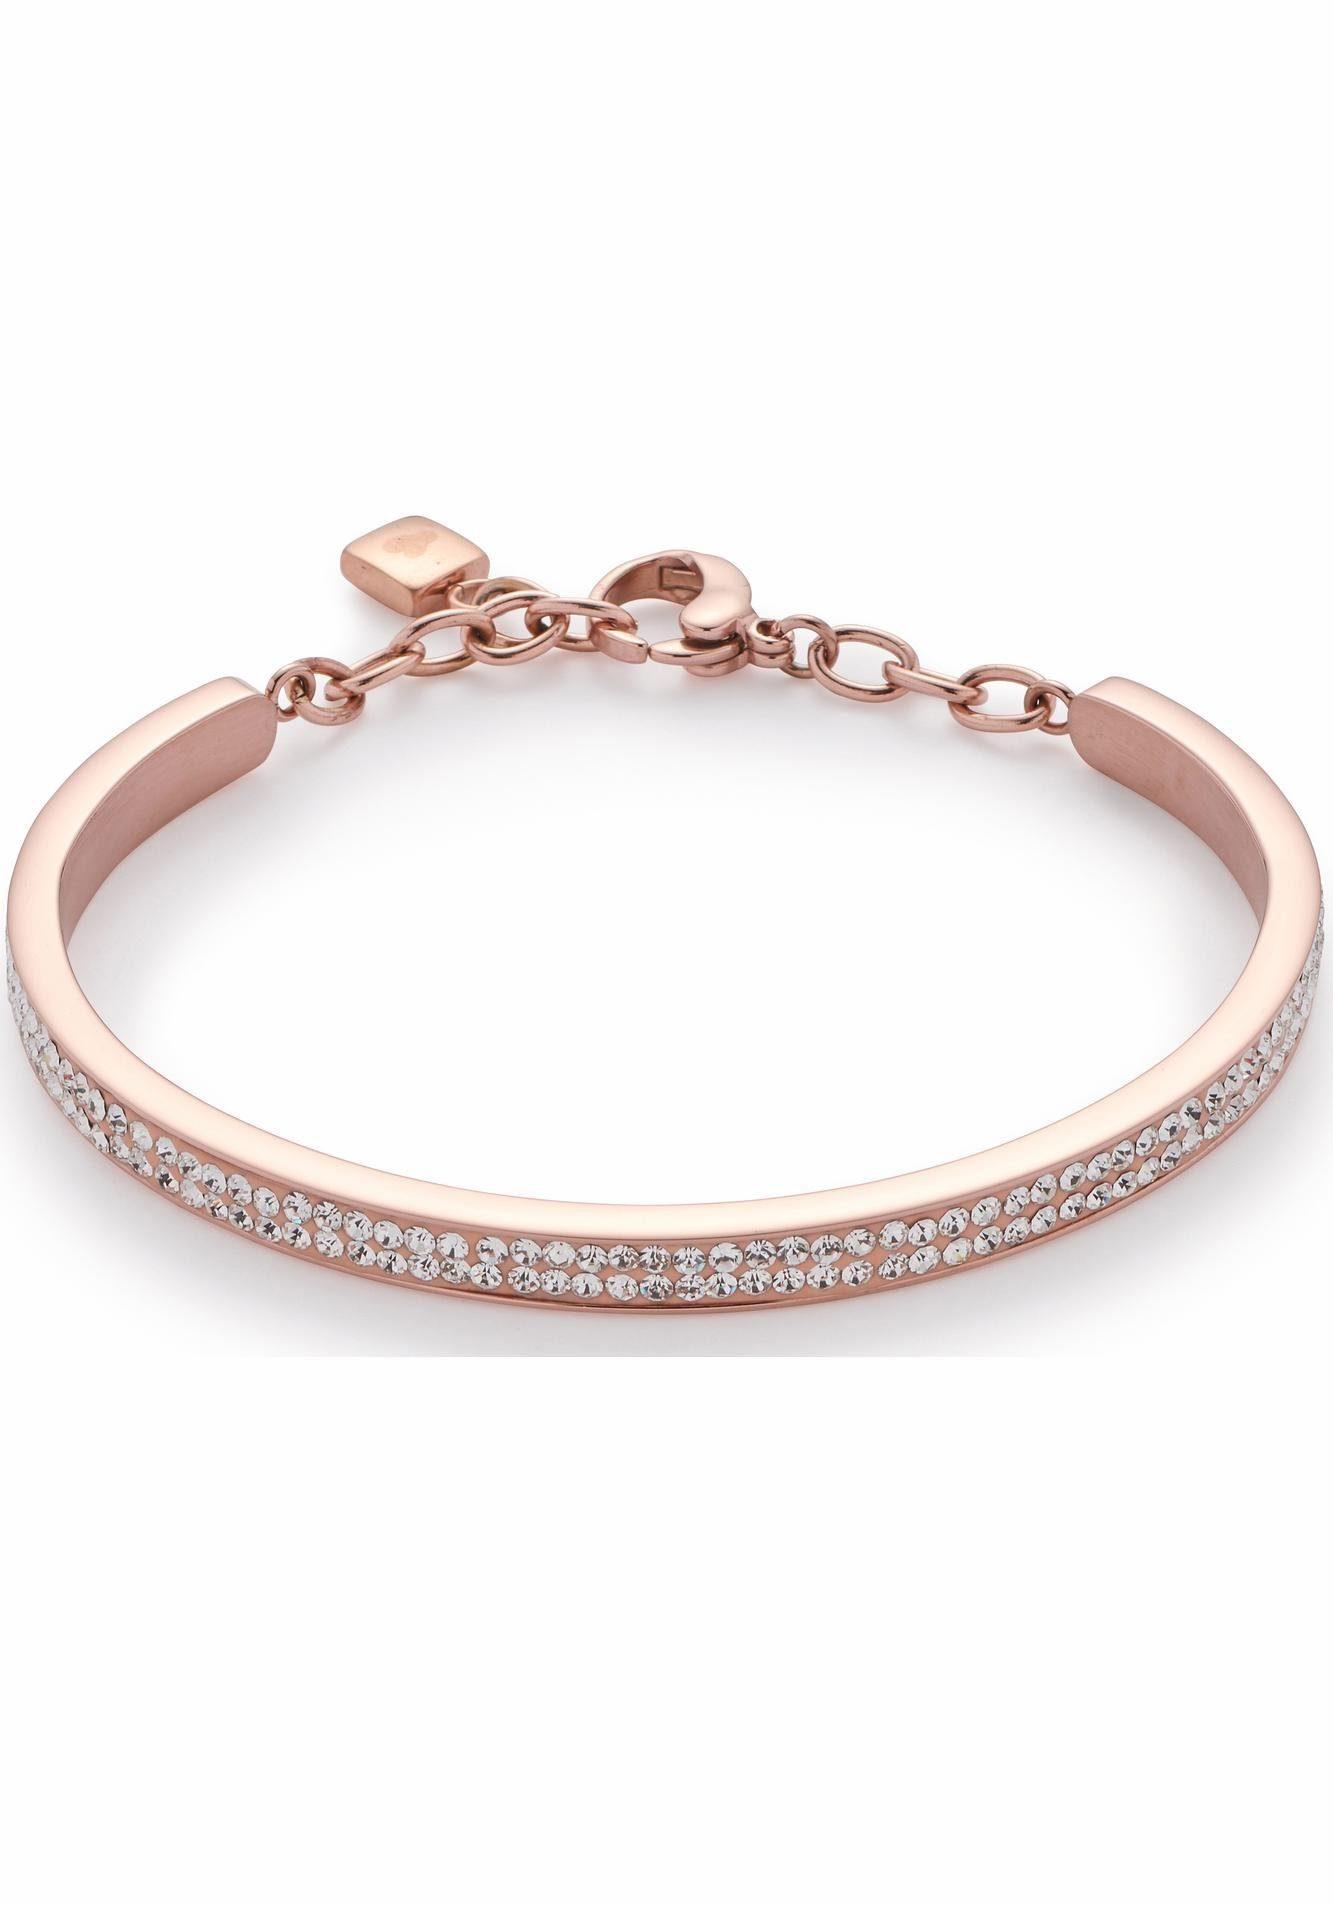 LEONARDO Armreif »Brillante roségold, 016347« mit Kristallsteinen